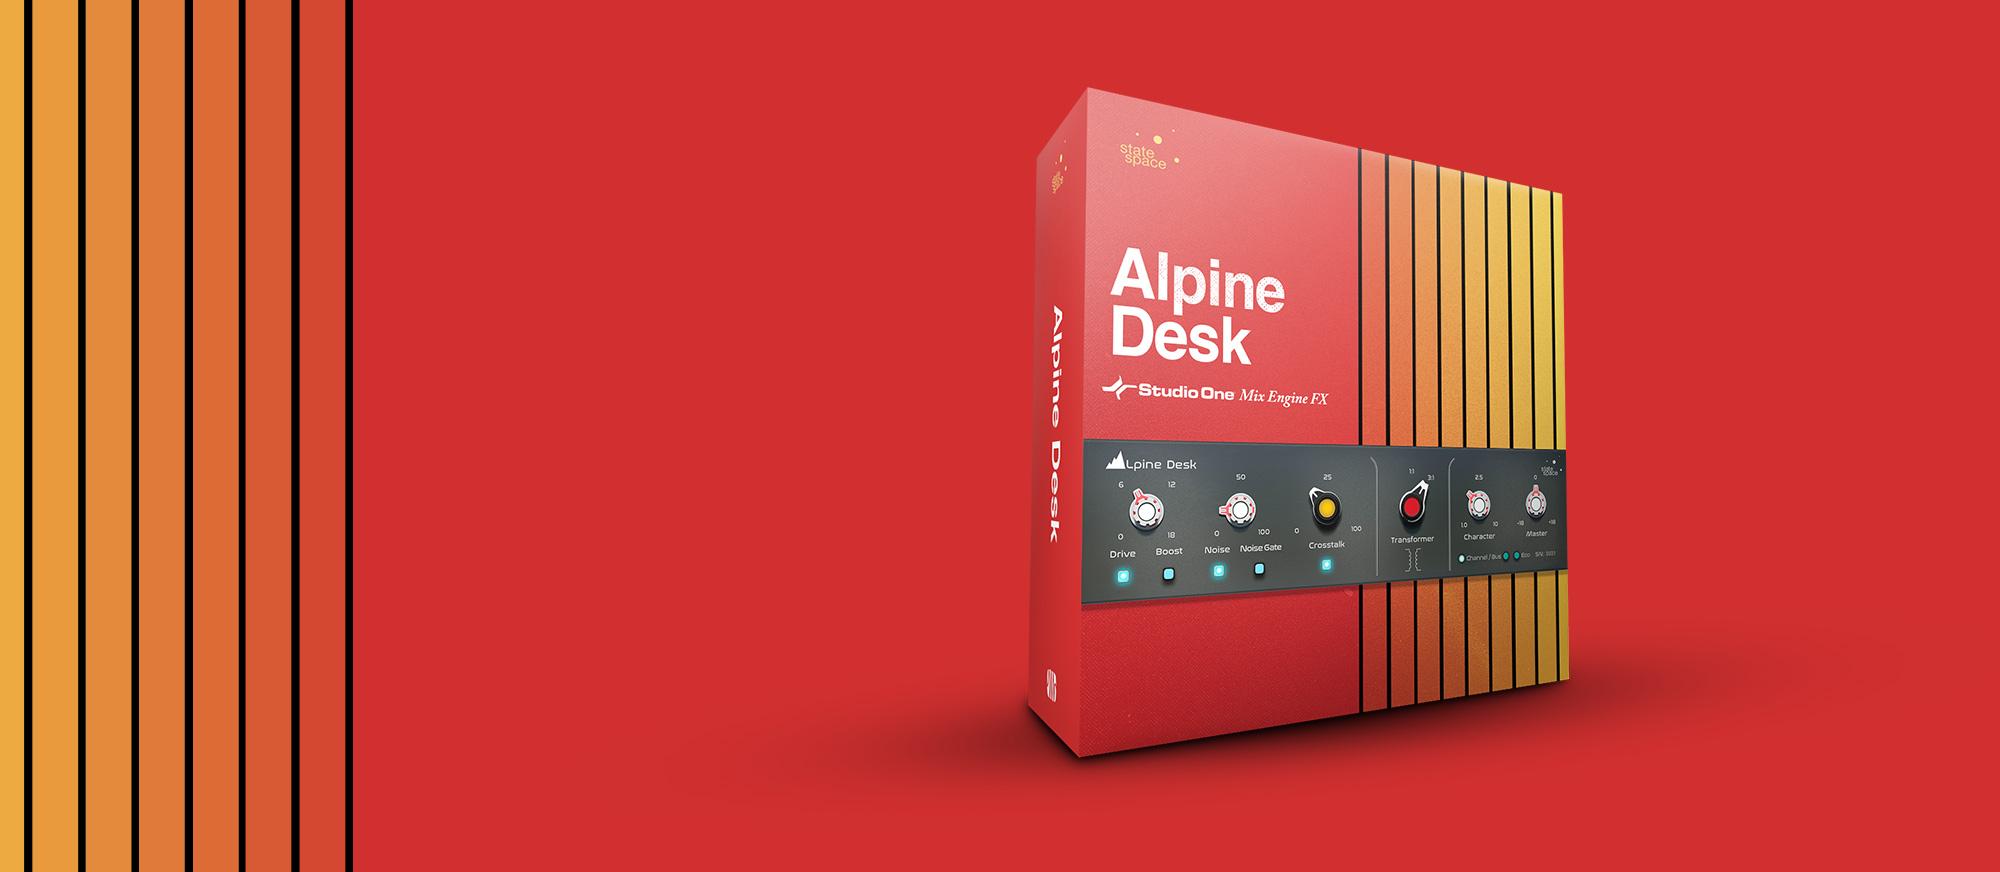 Alpine Desk box